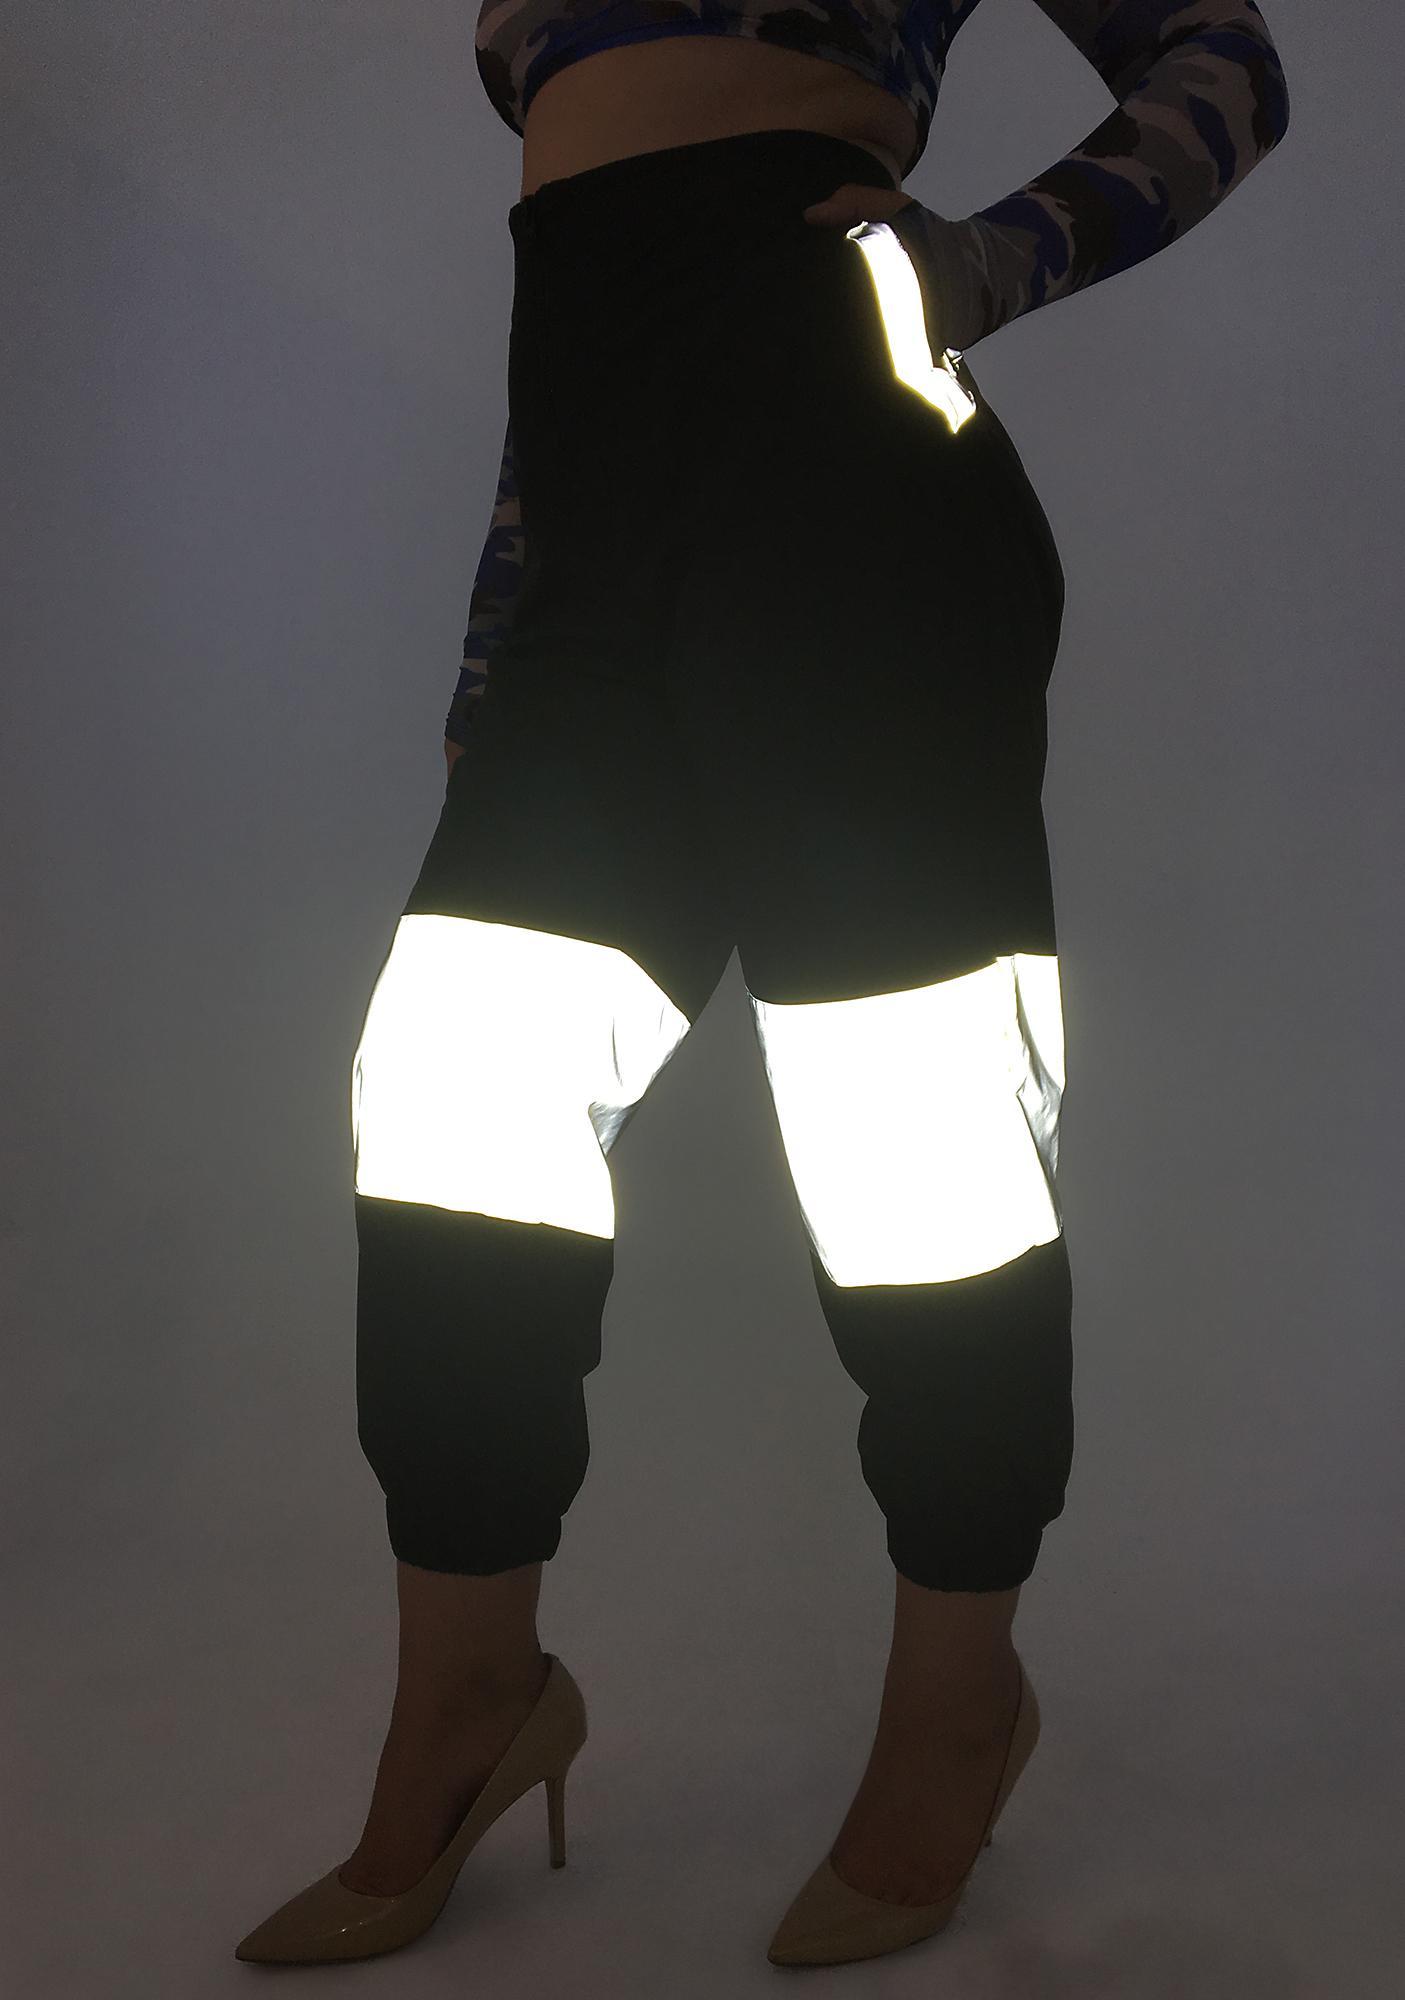 406e8ef7449 Poster Grl See Me Shining Reflective Pants